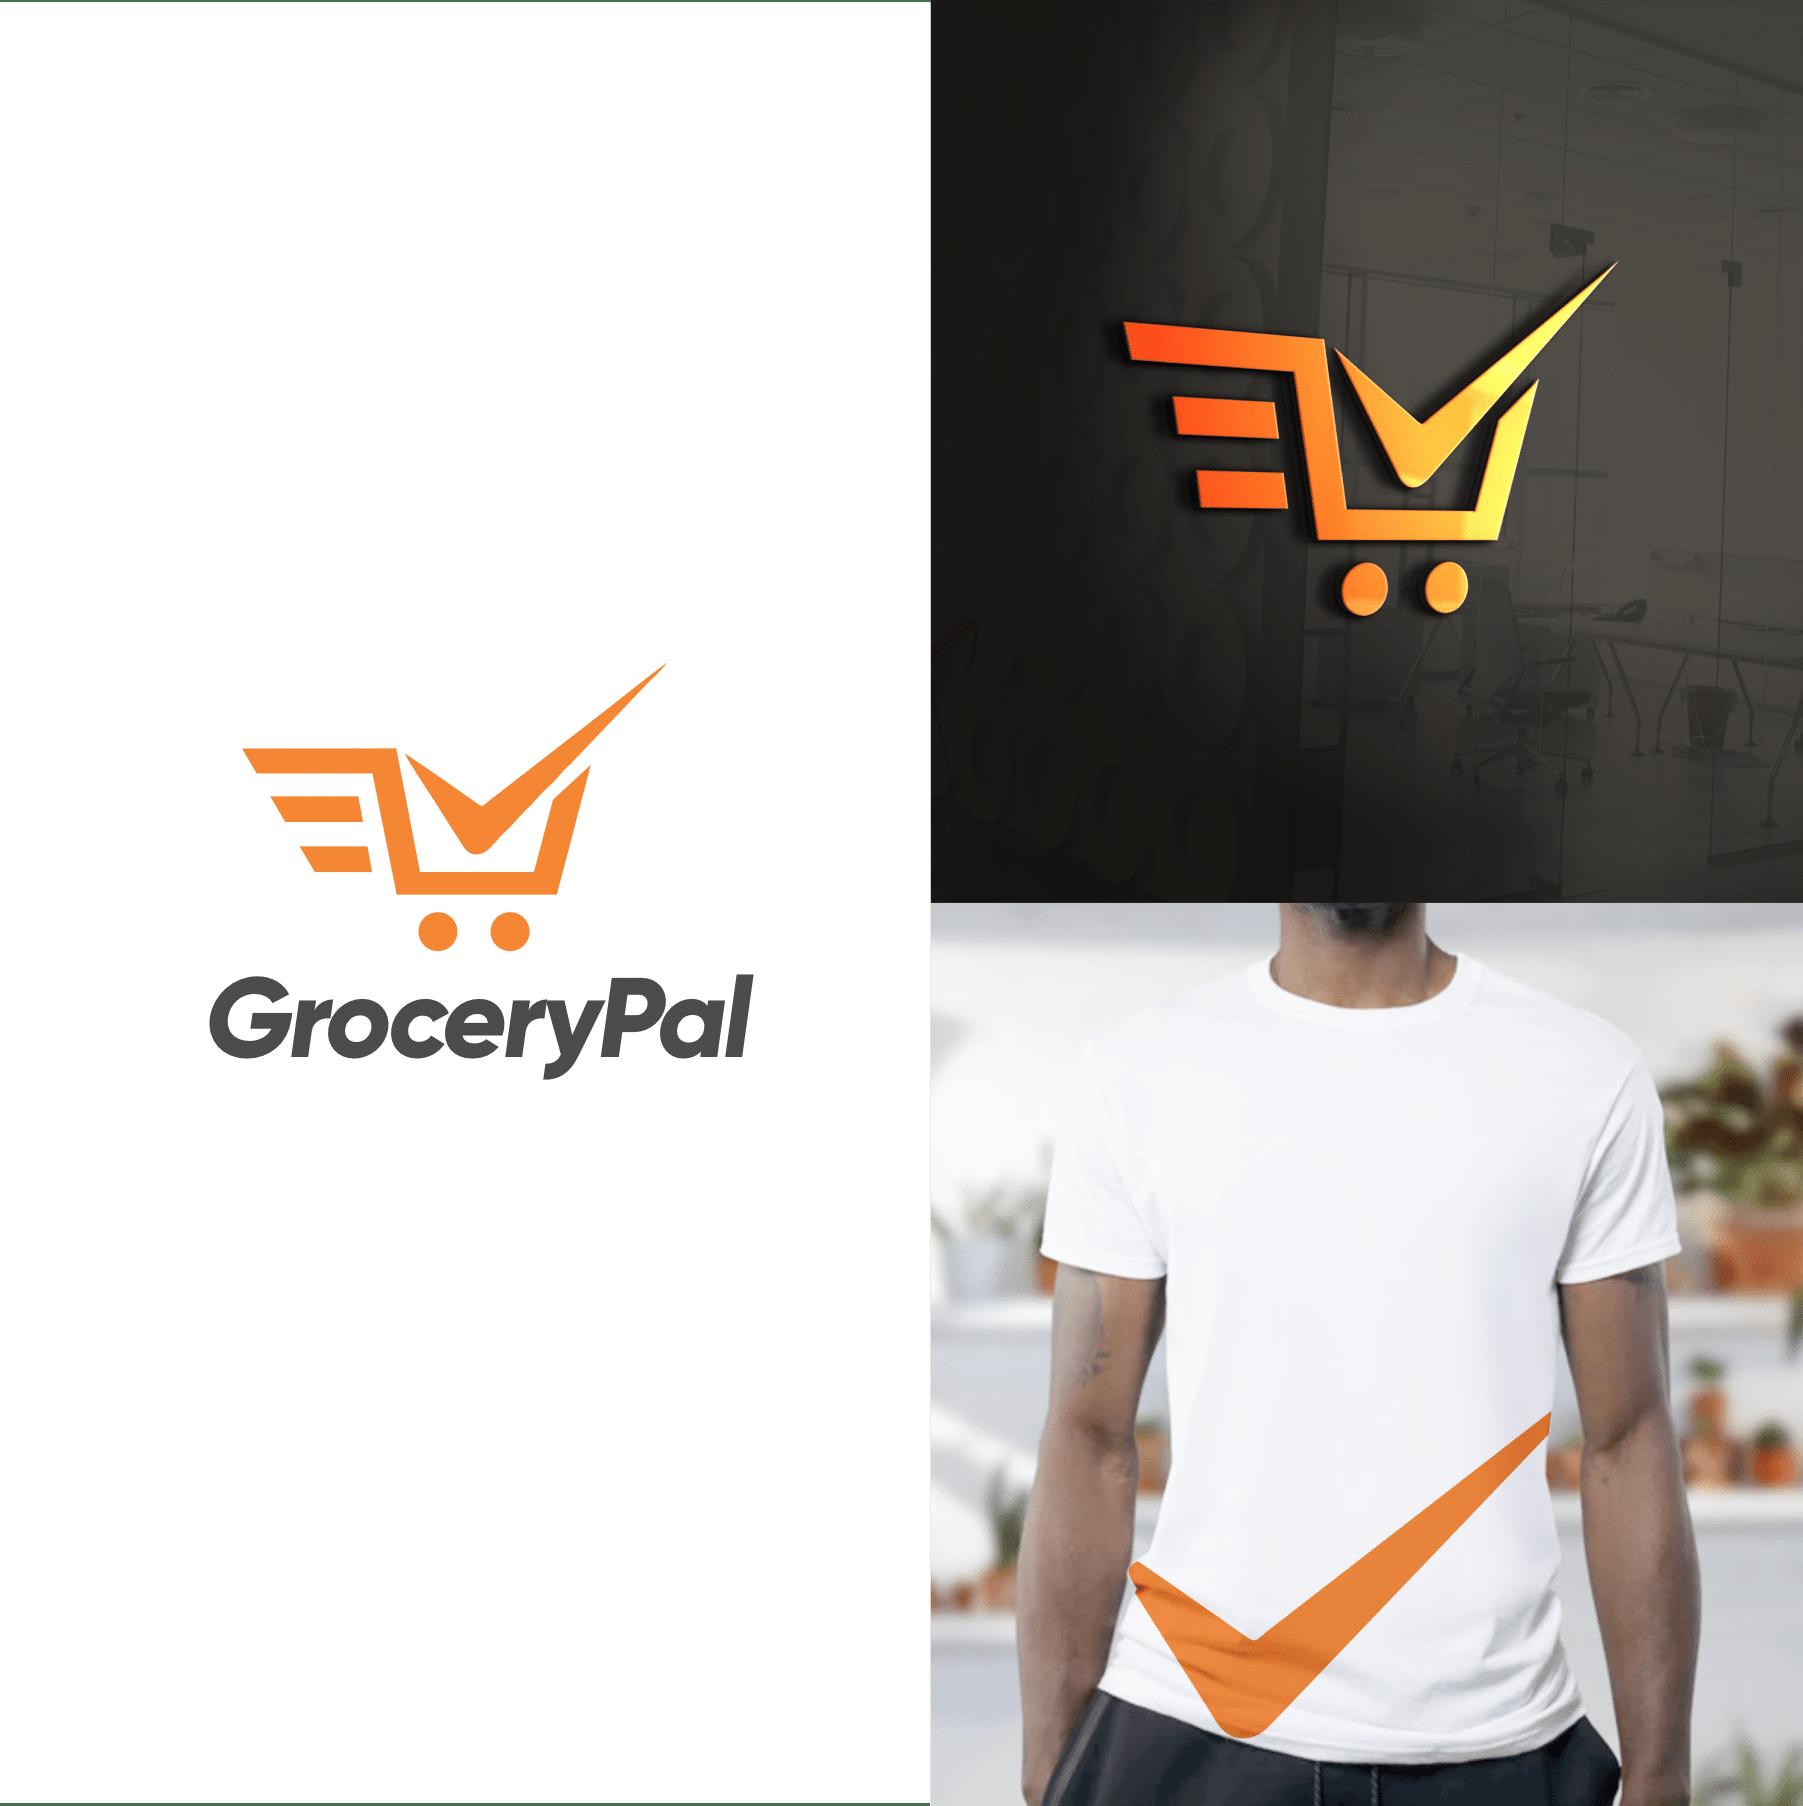 Backup_of_Backup_of_grocery pal branding